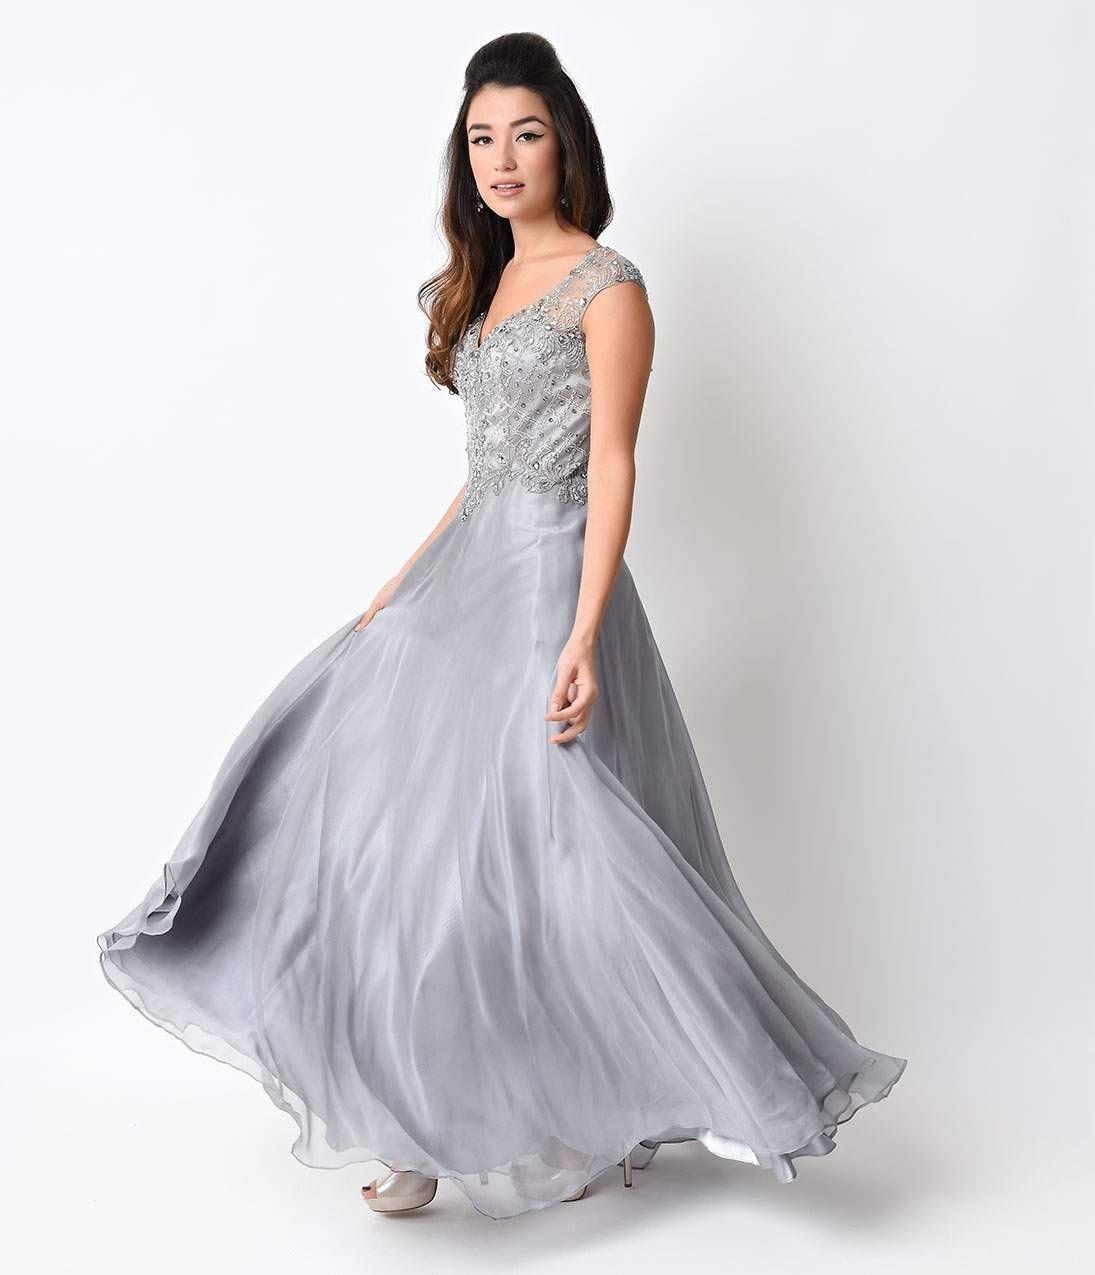 Prom Dresses Chanel